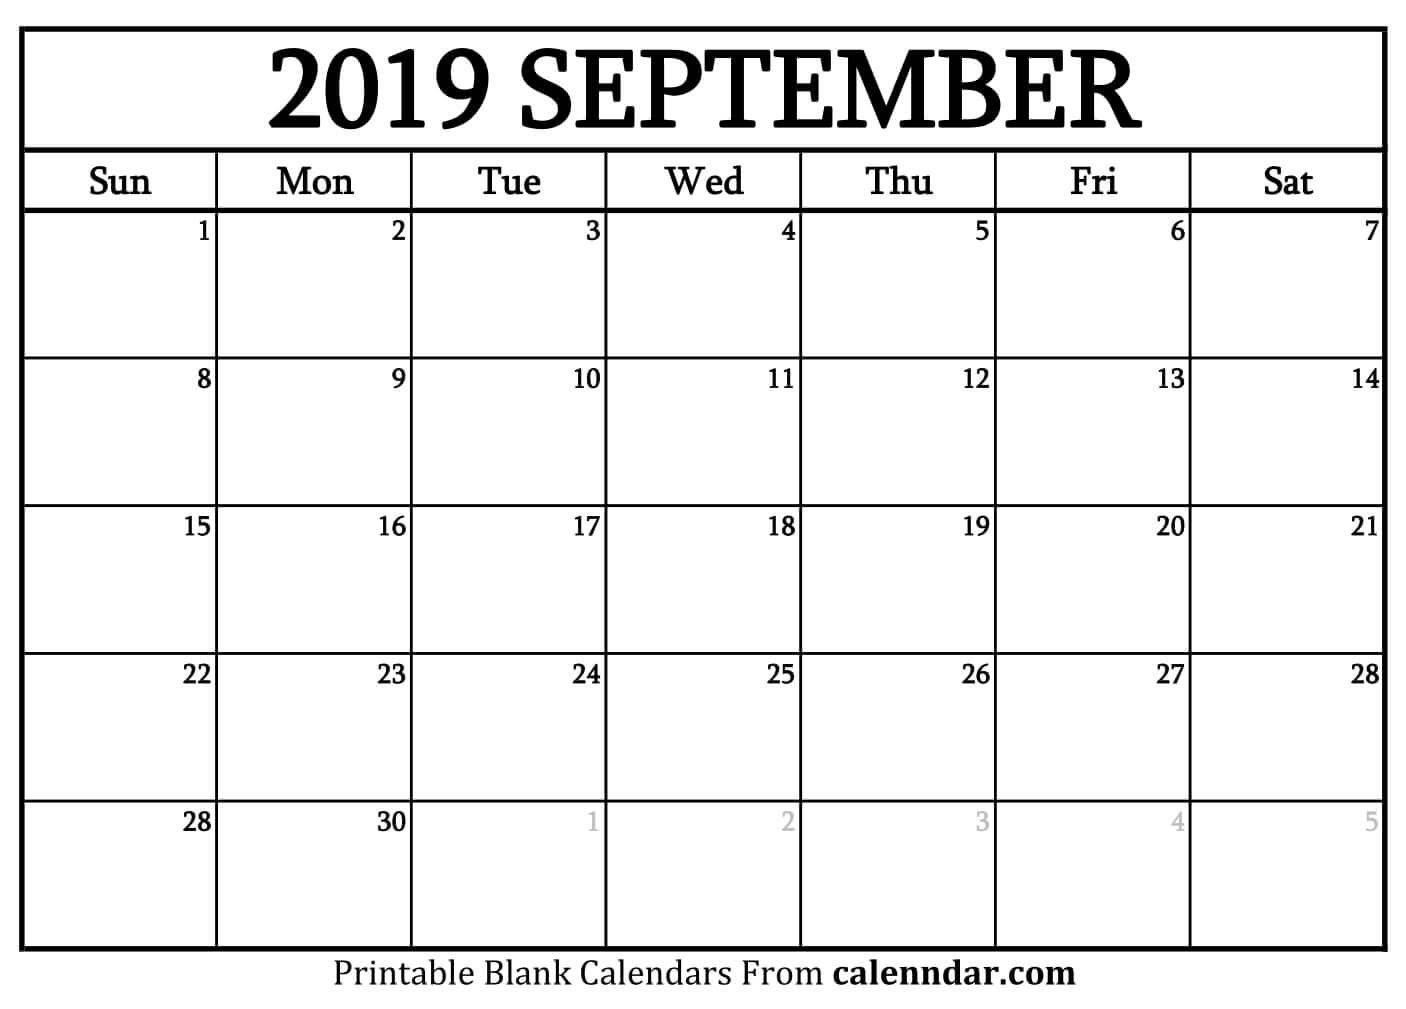 Blank September 2019 Calendar Templates - Calenndar Calendar Of 2019 September